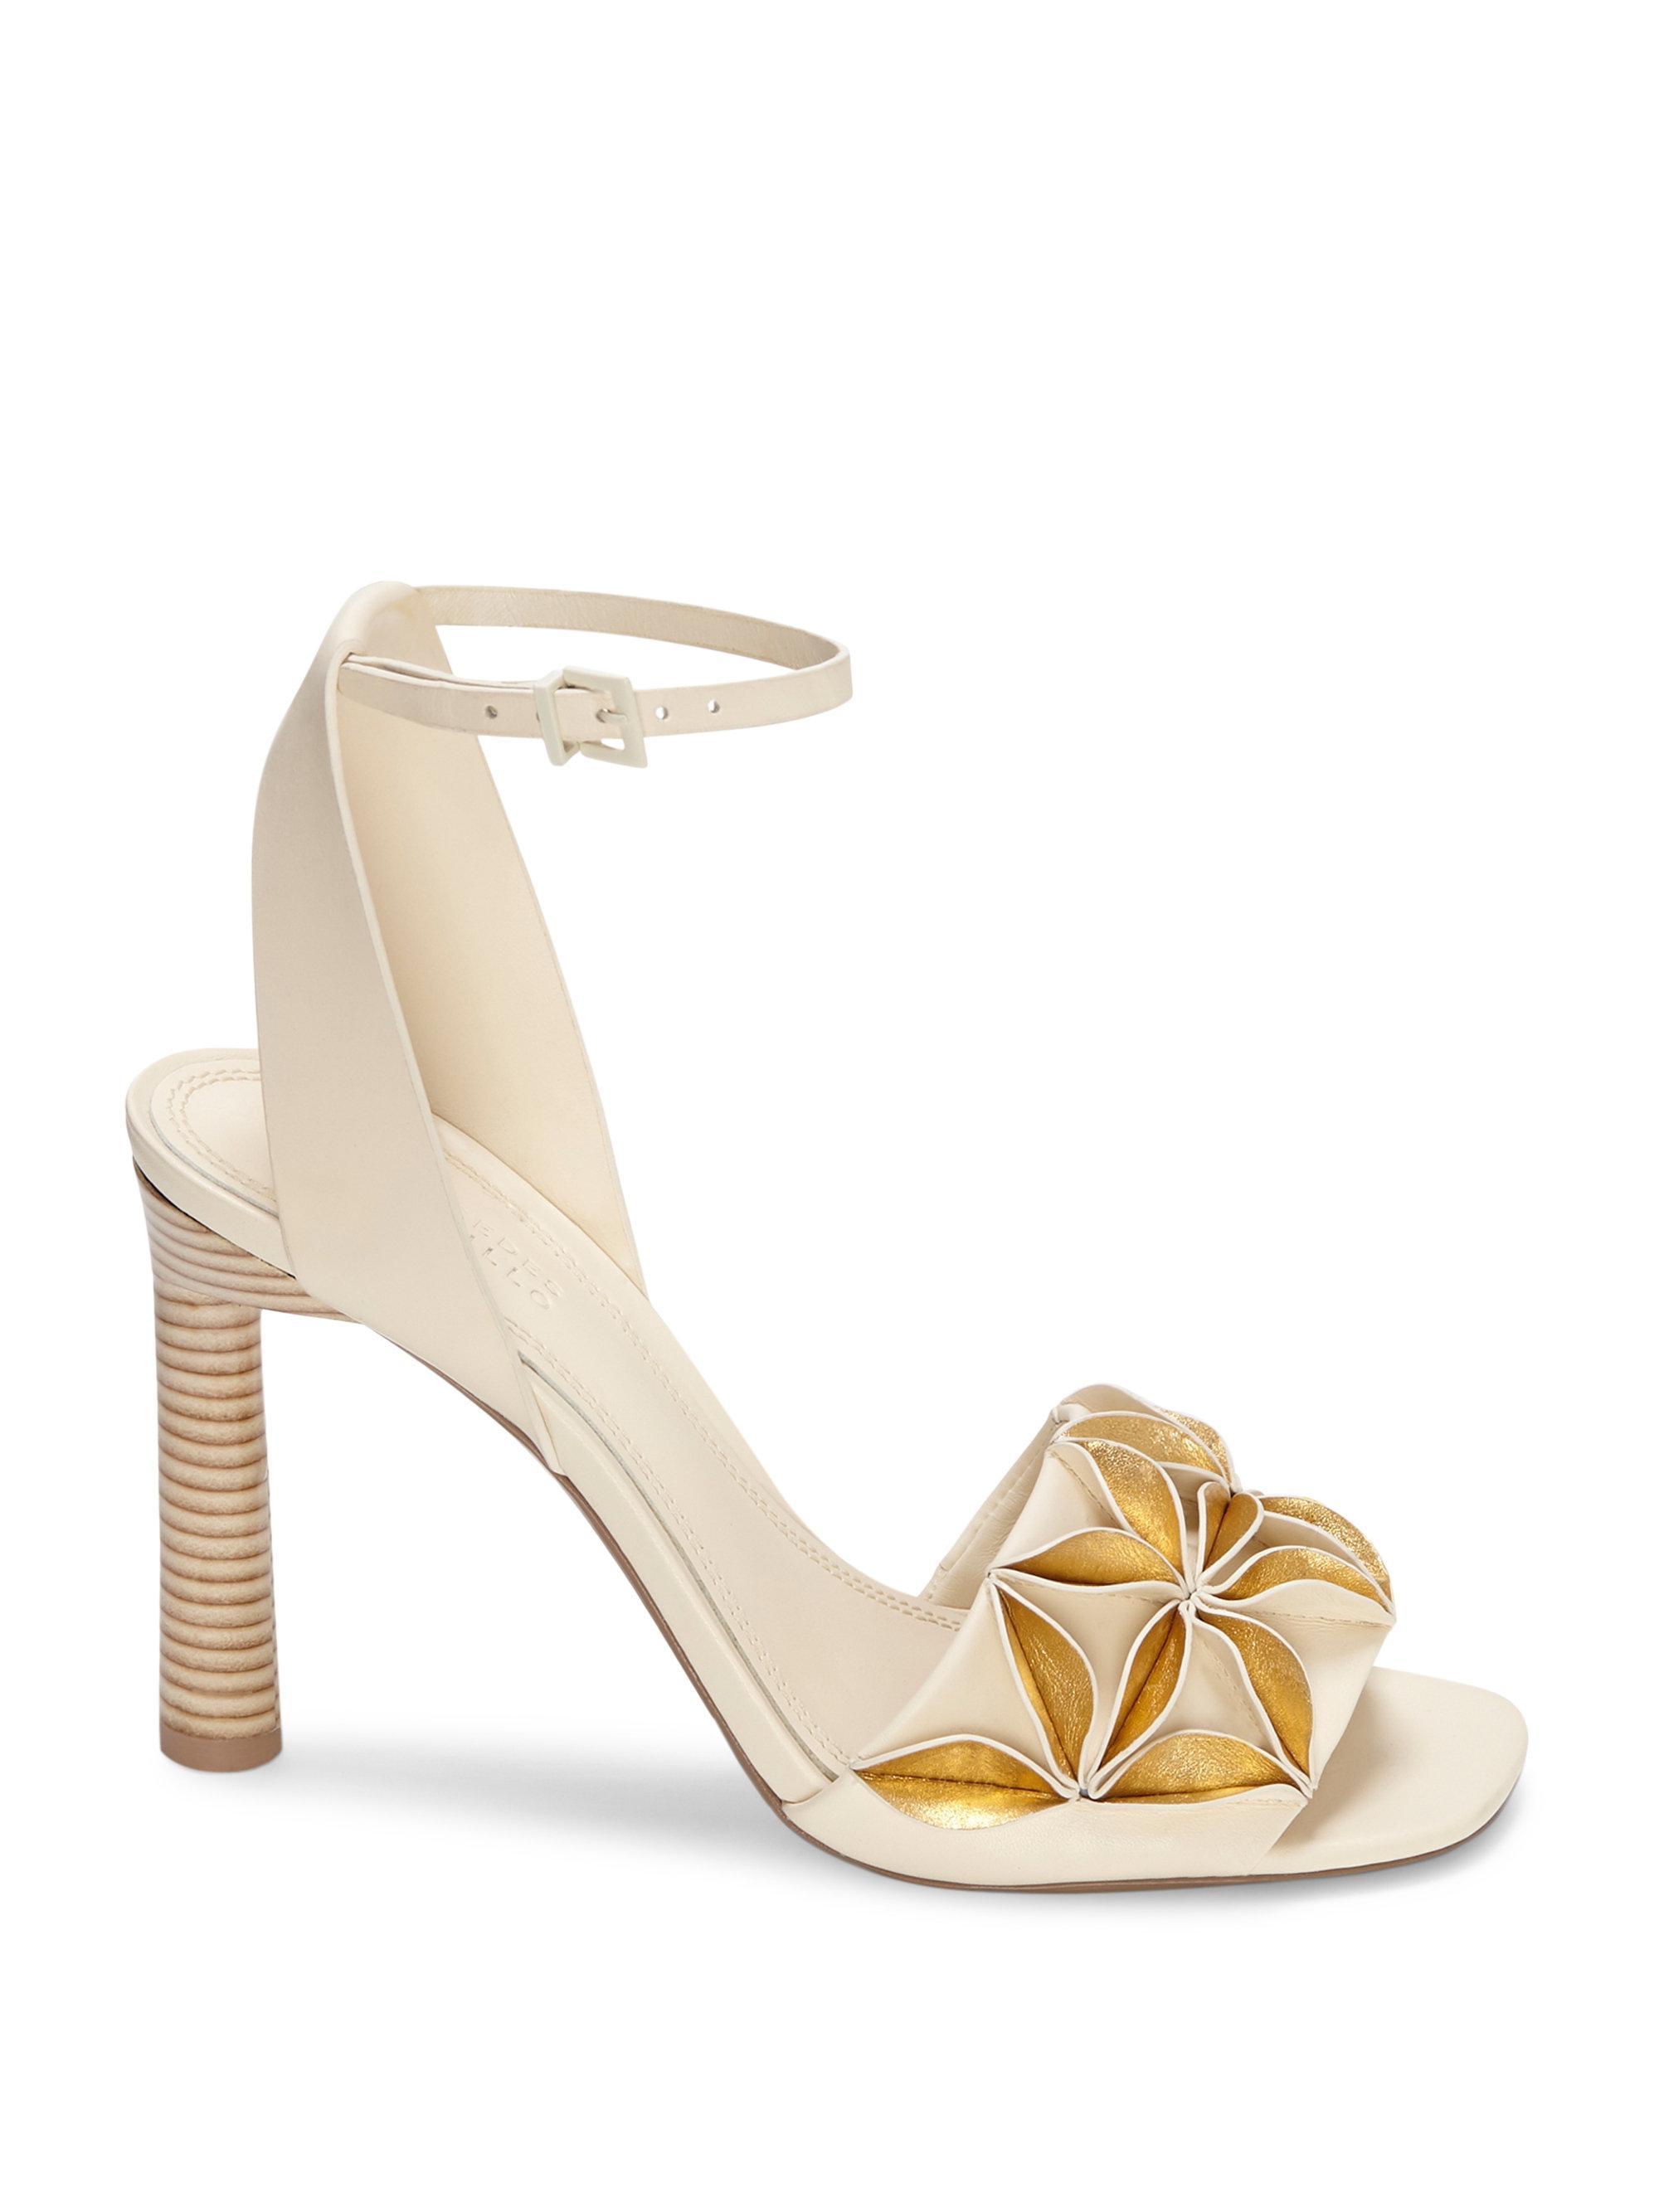 Mercedes Castillo Milee Ivory & Gold Sandals w2GFlzNhh7